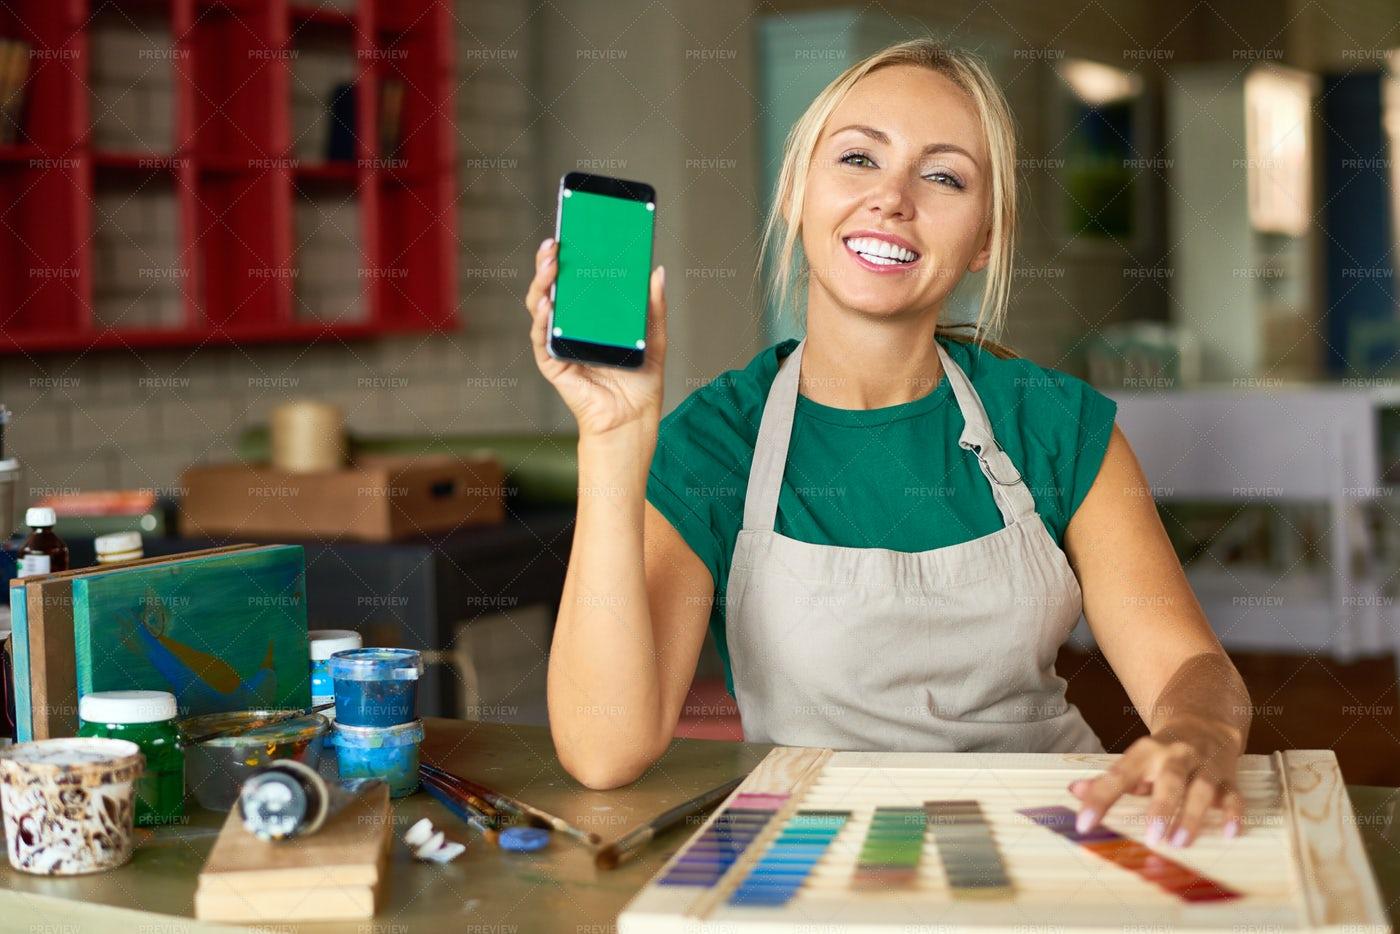 Female Artist Presenting Mobile App: Stock Photos